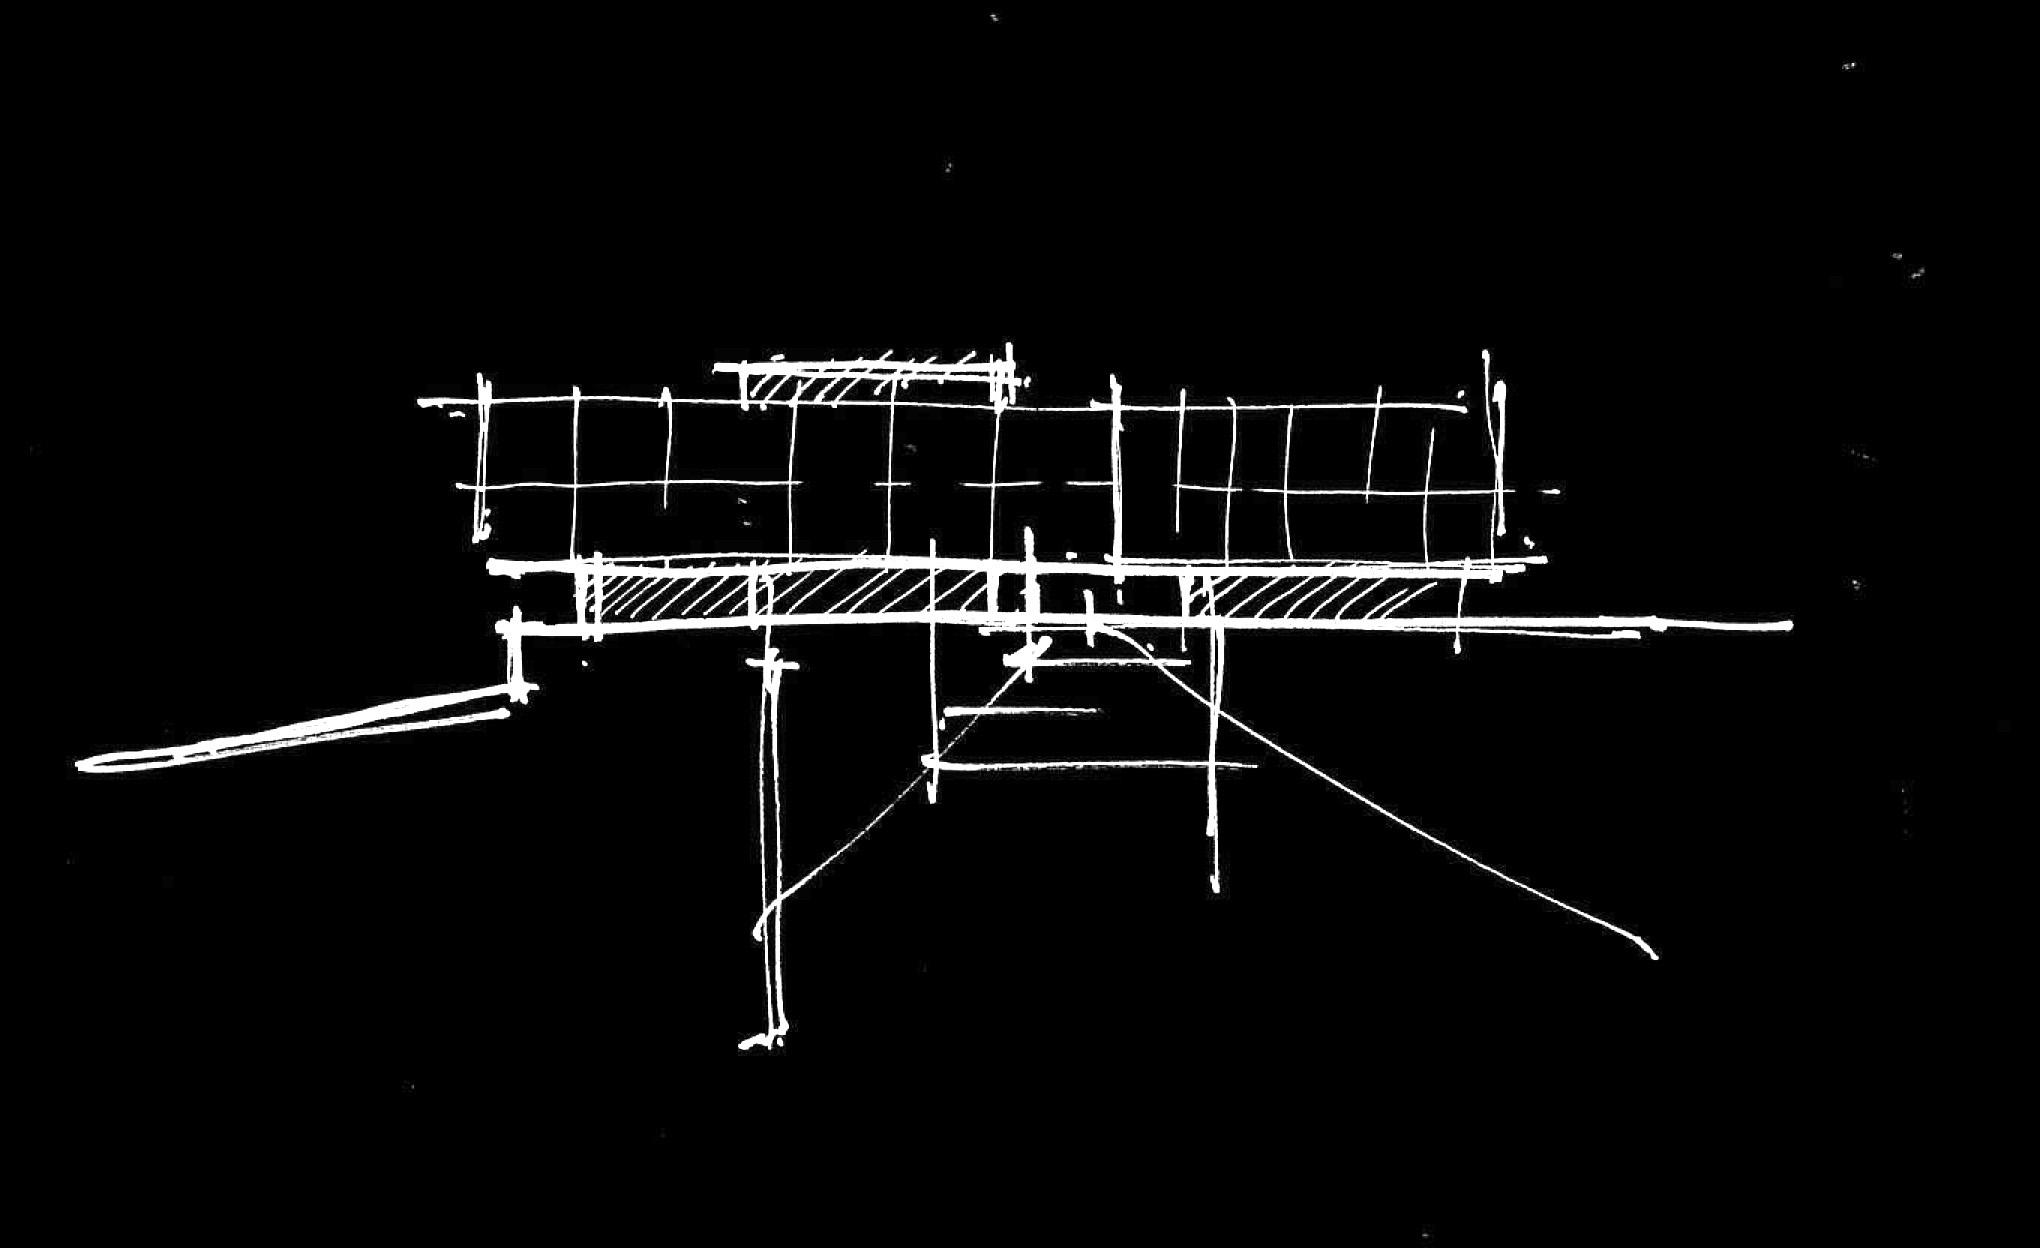 McKinley Burkart_Mark Burkart_Sketch (3)_inverted.jpg